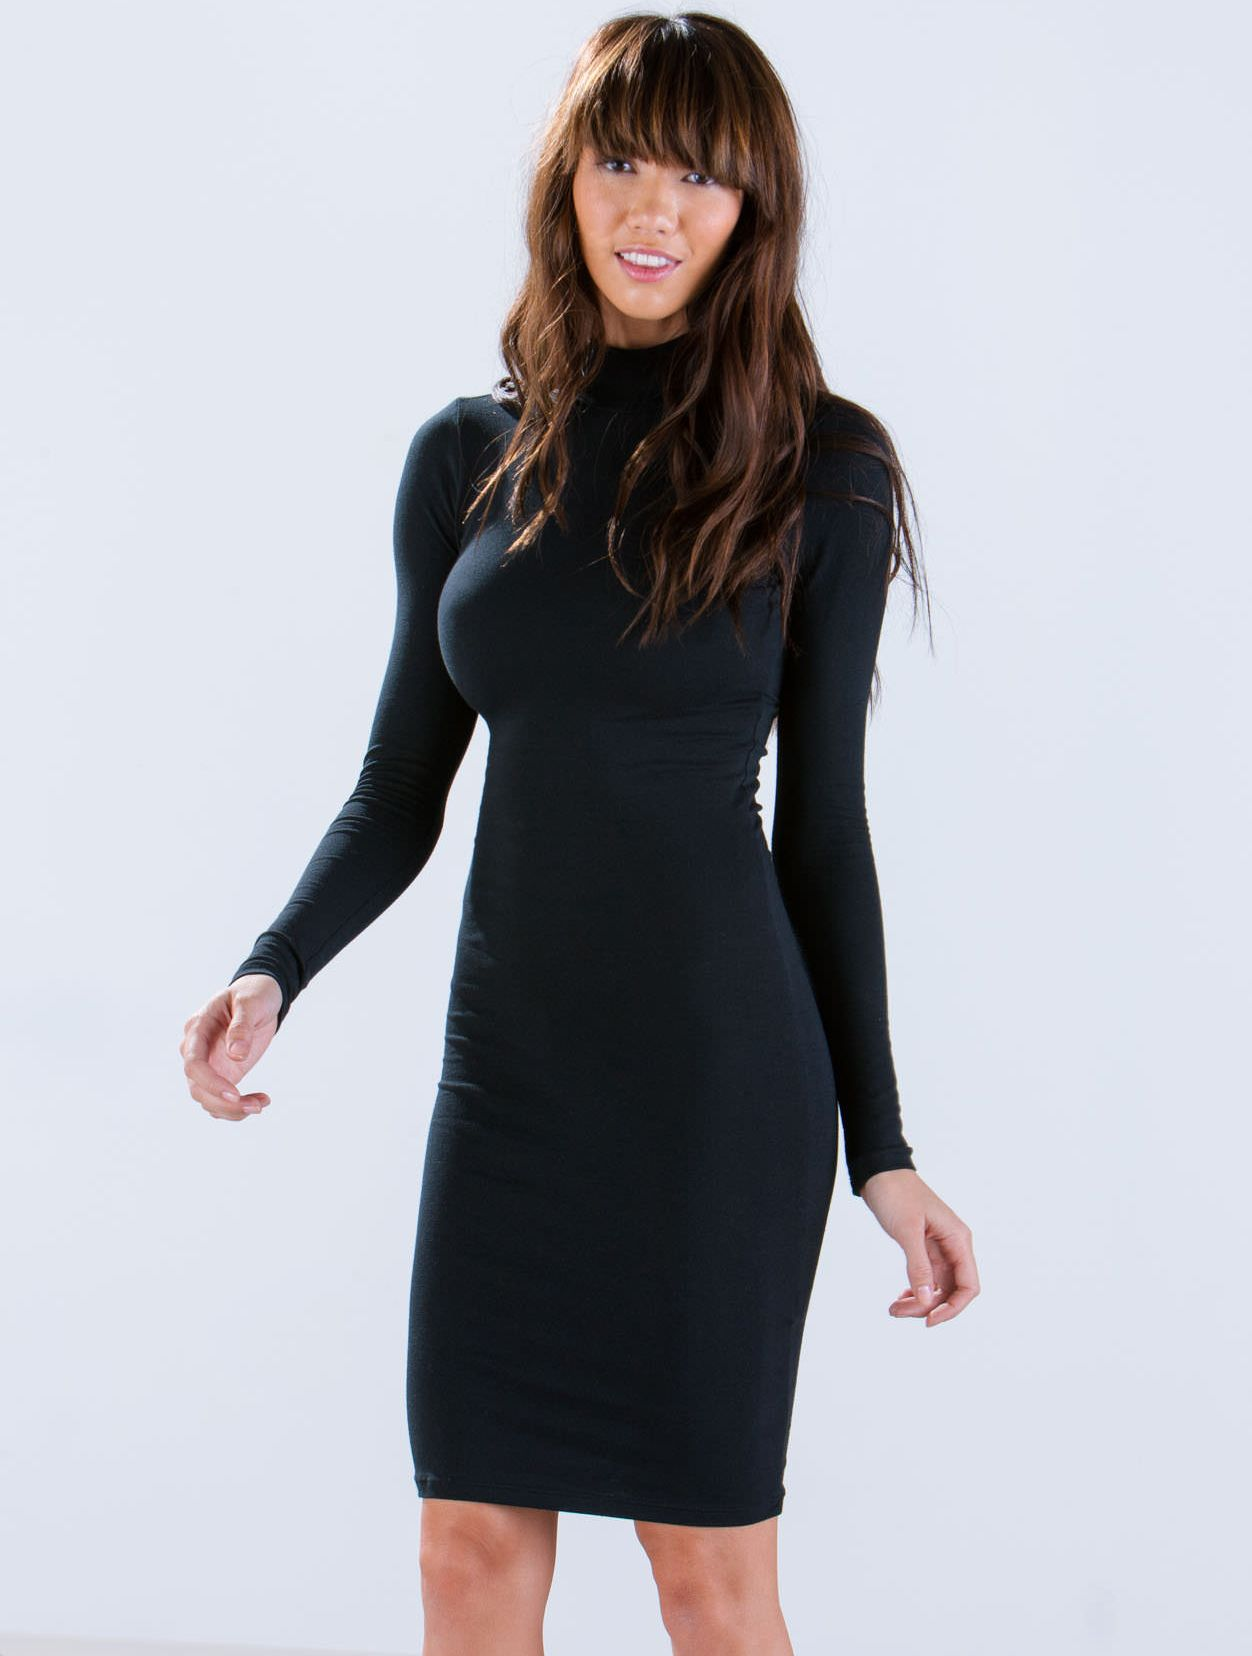 Vestido gasa manga larga-negro 14.44   For My !!   Pinterest